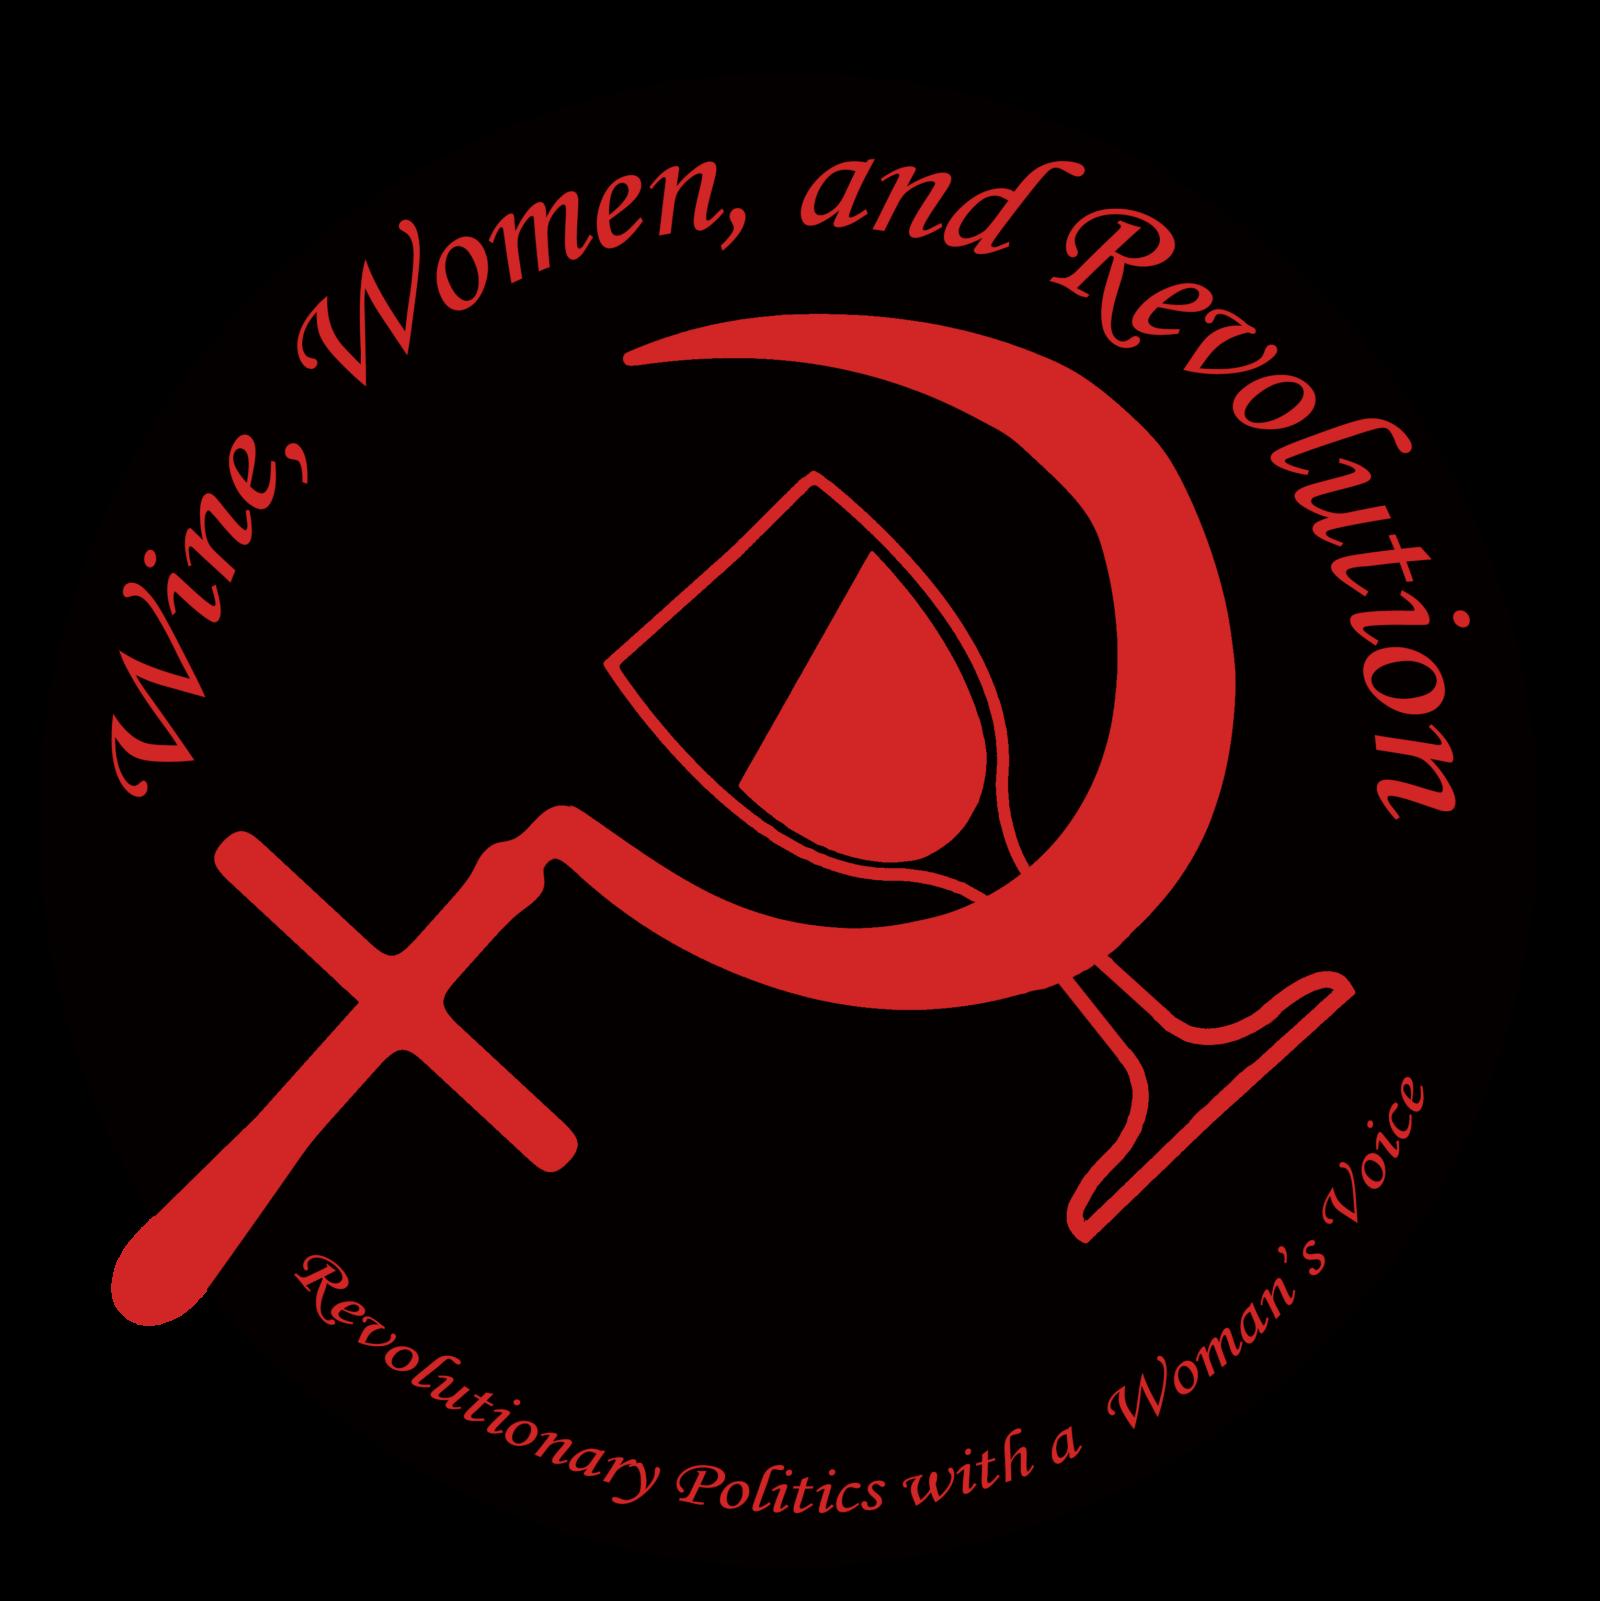 Wine, Women, and Revolution